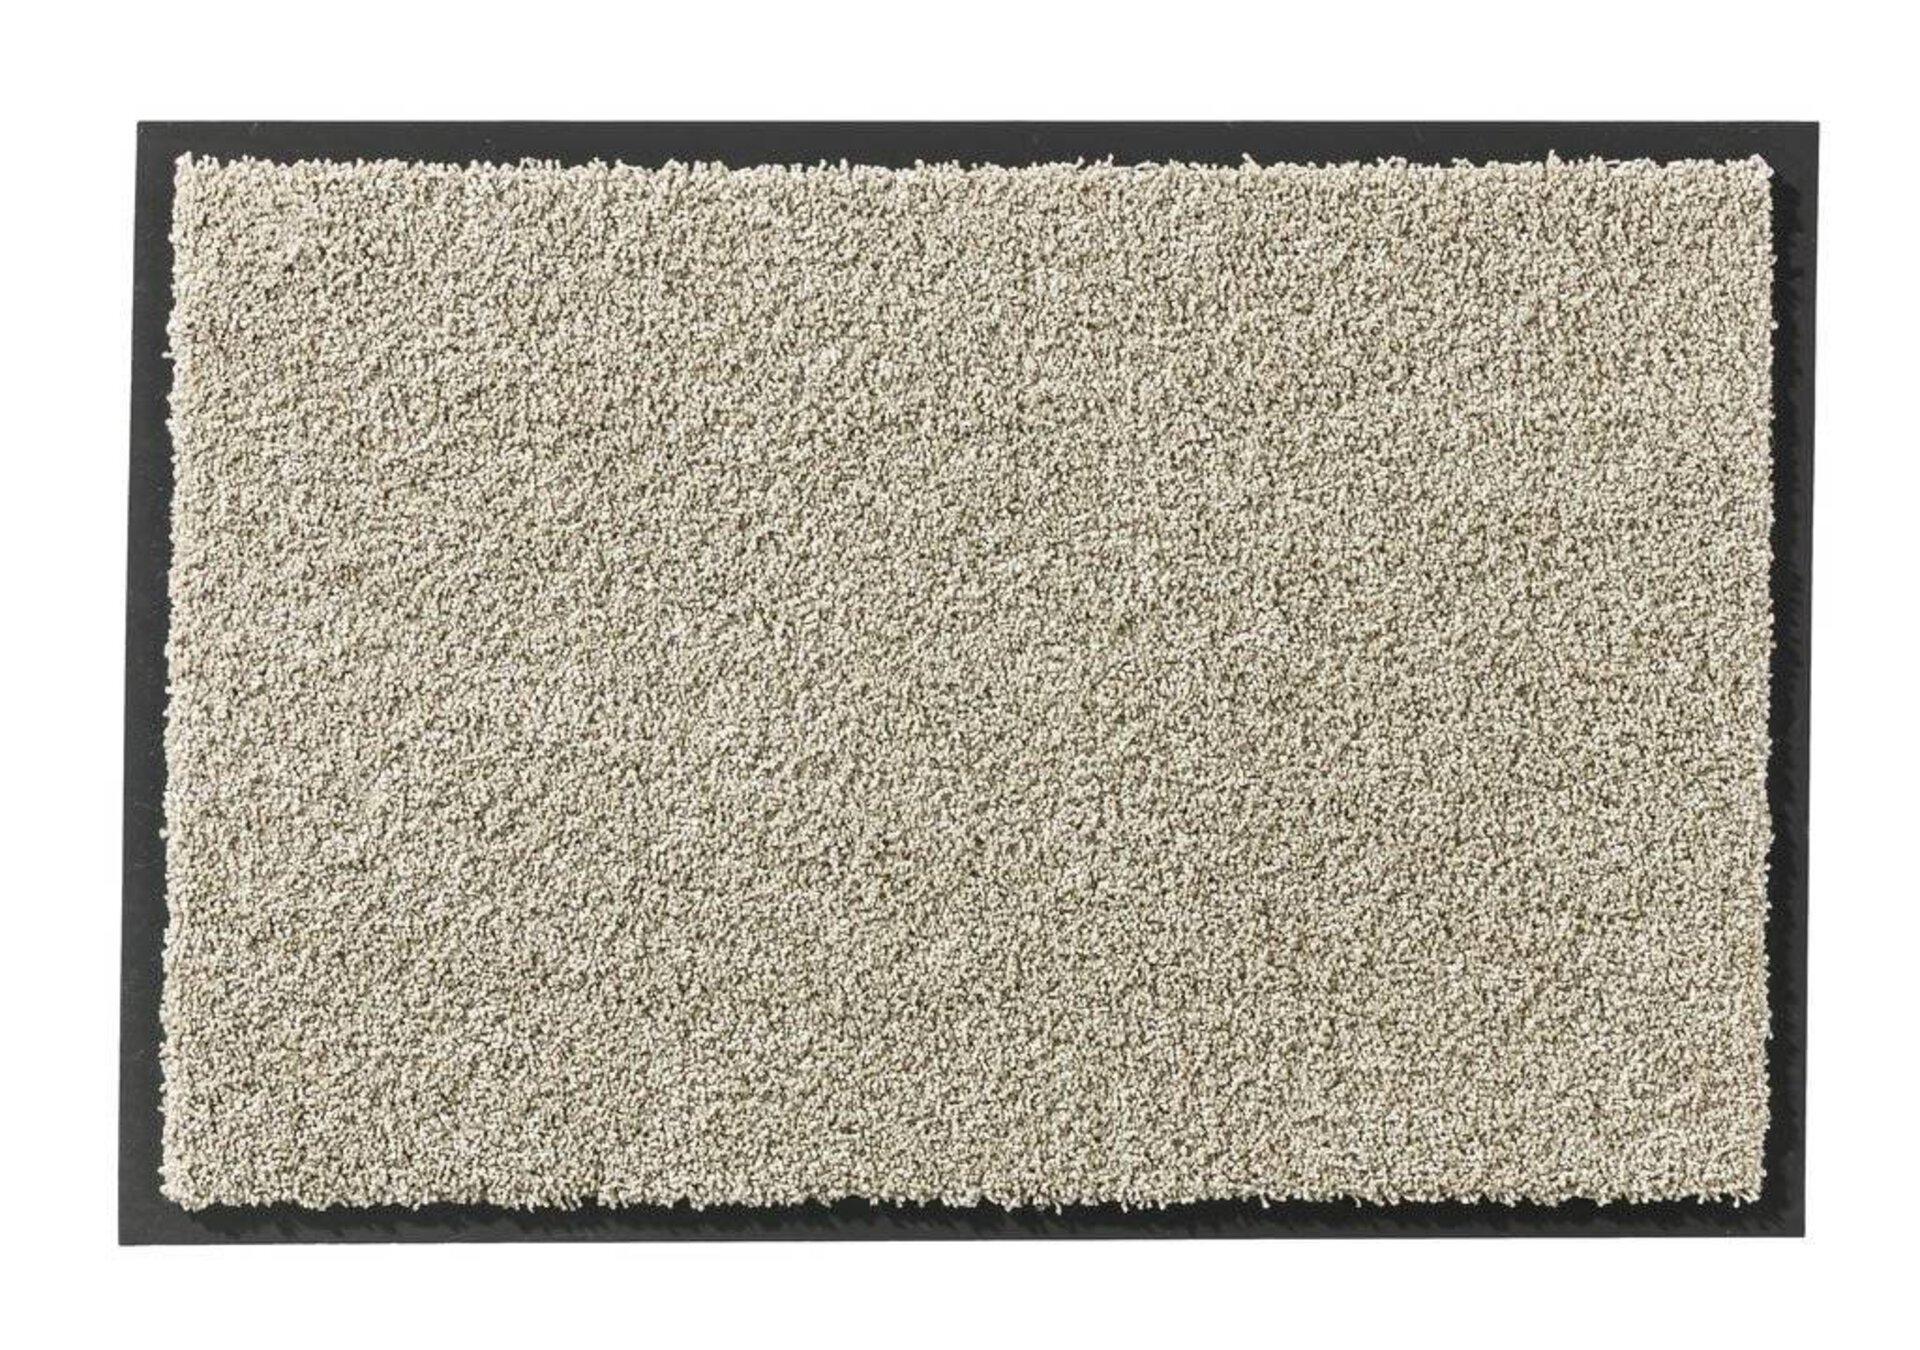 Türmatte Marmois Astra Textil beige 40 x 60 cm